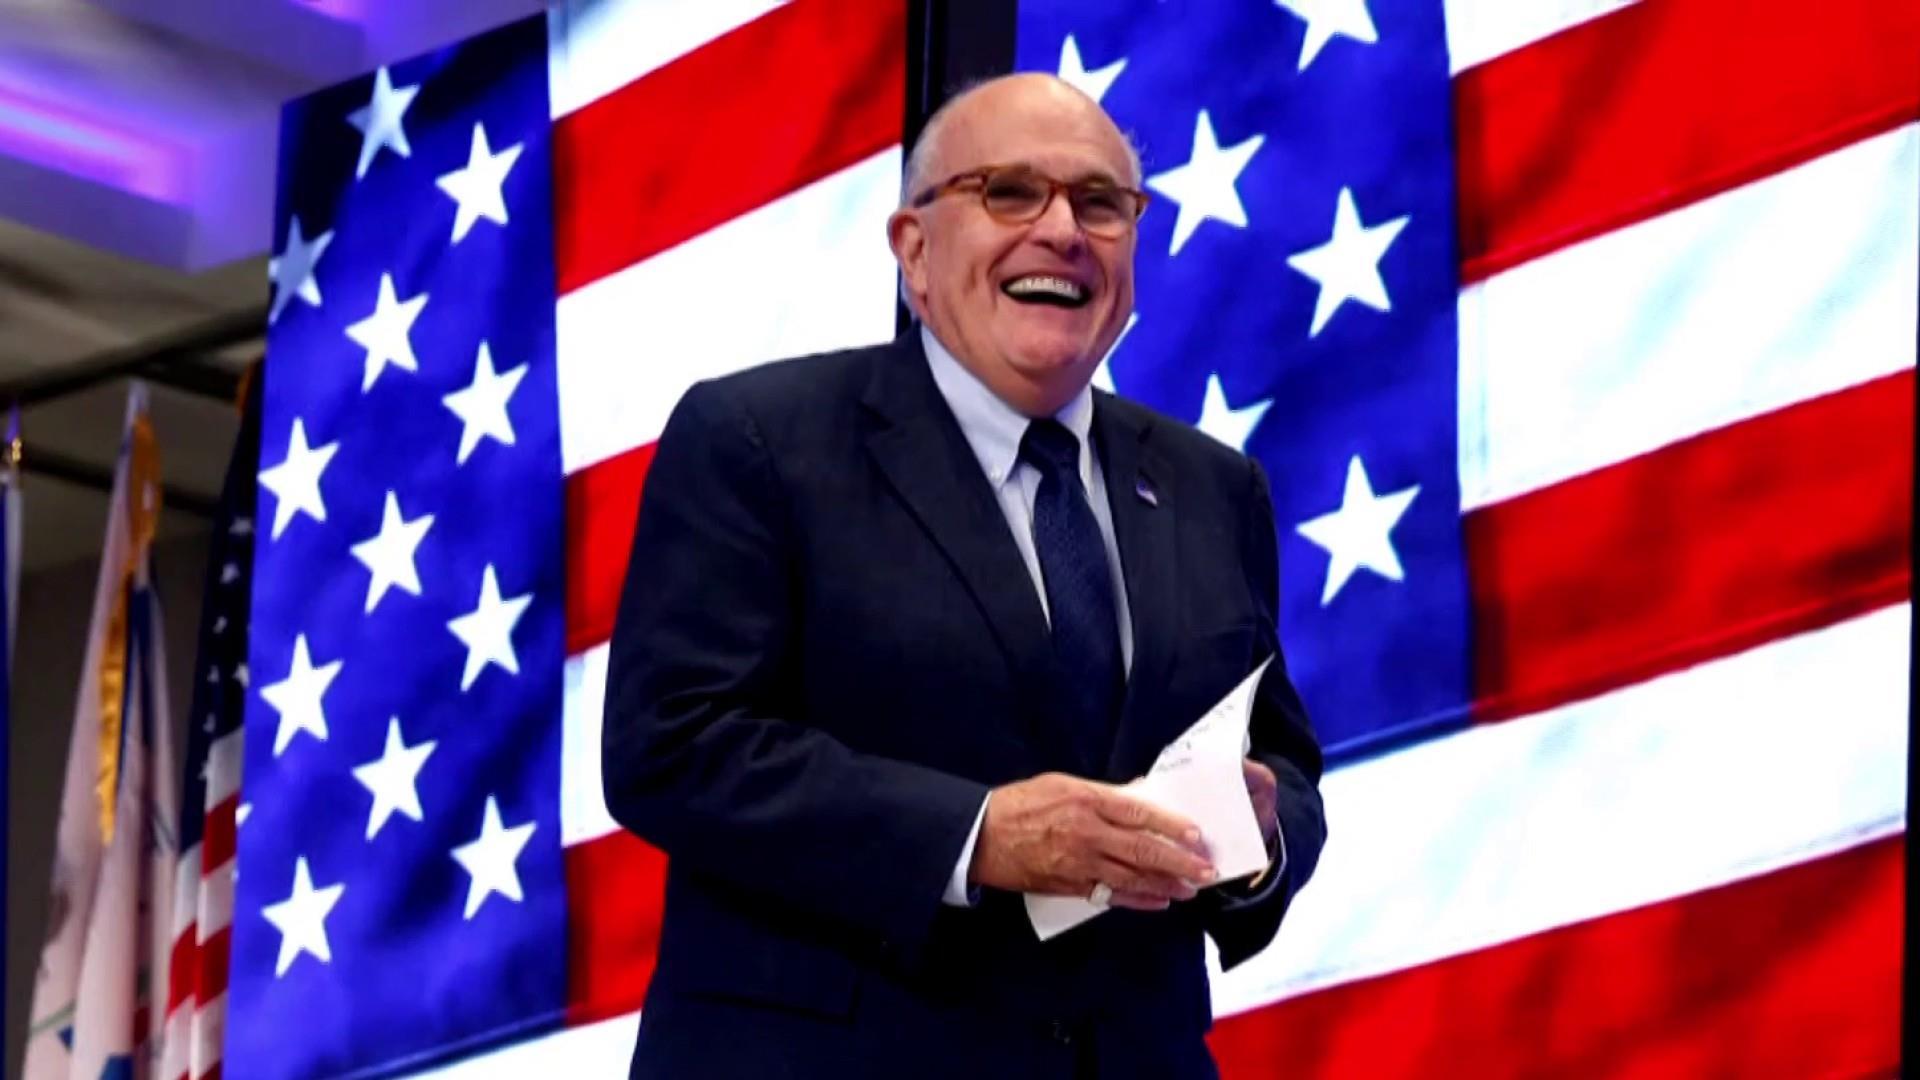 Rudy Giuliani's disinformation dossier